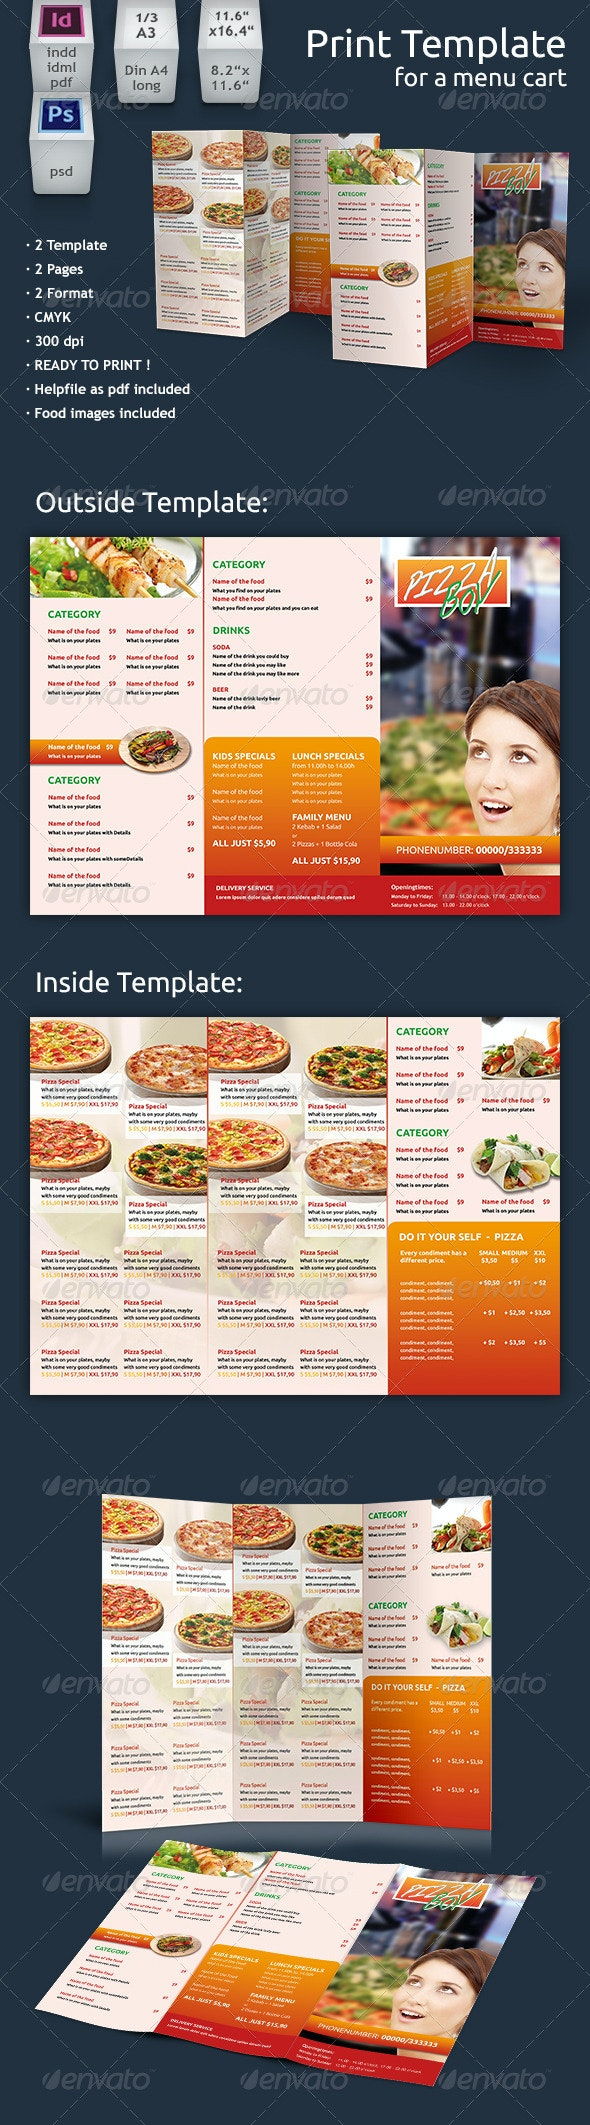 Restaurant Menu Print Template - Restaurant Flyers